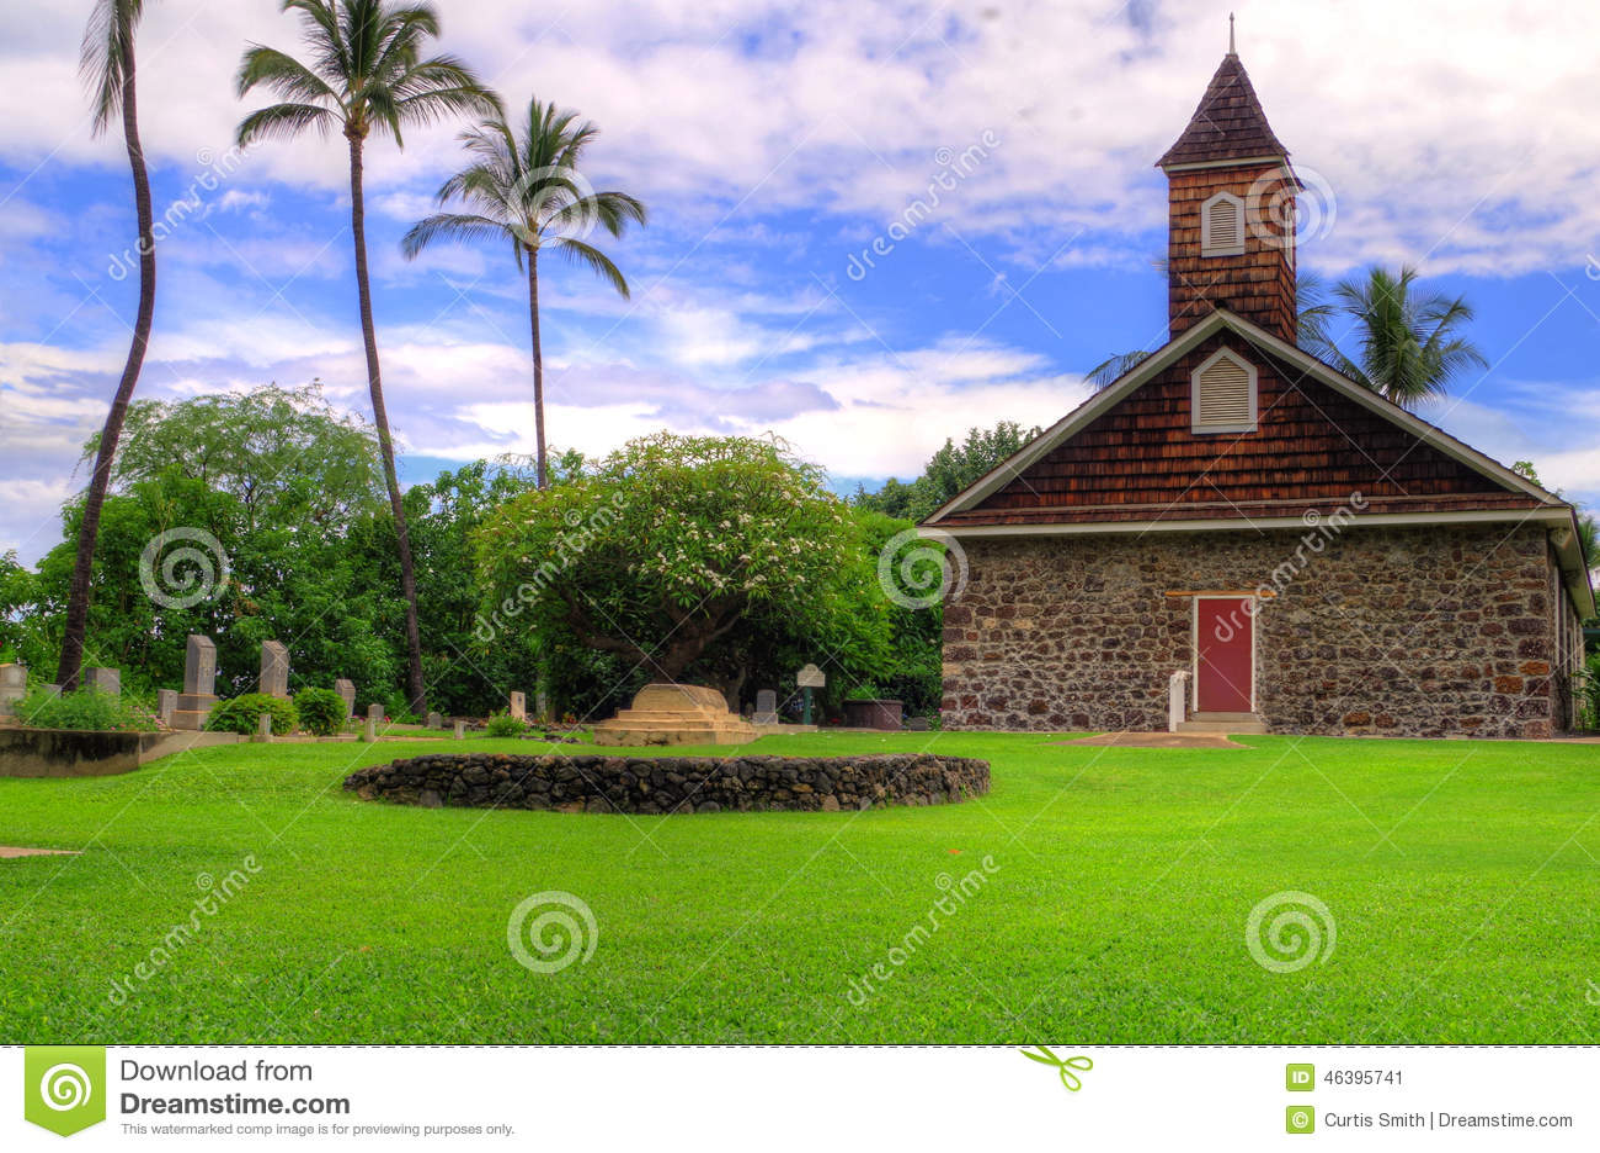 Old stone church in Maui, Hawaii